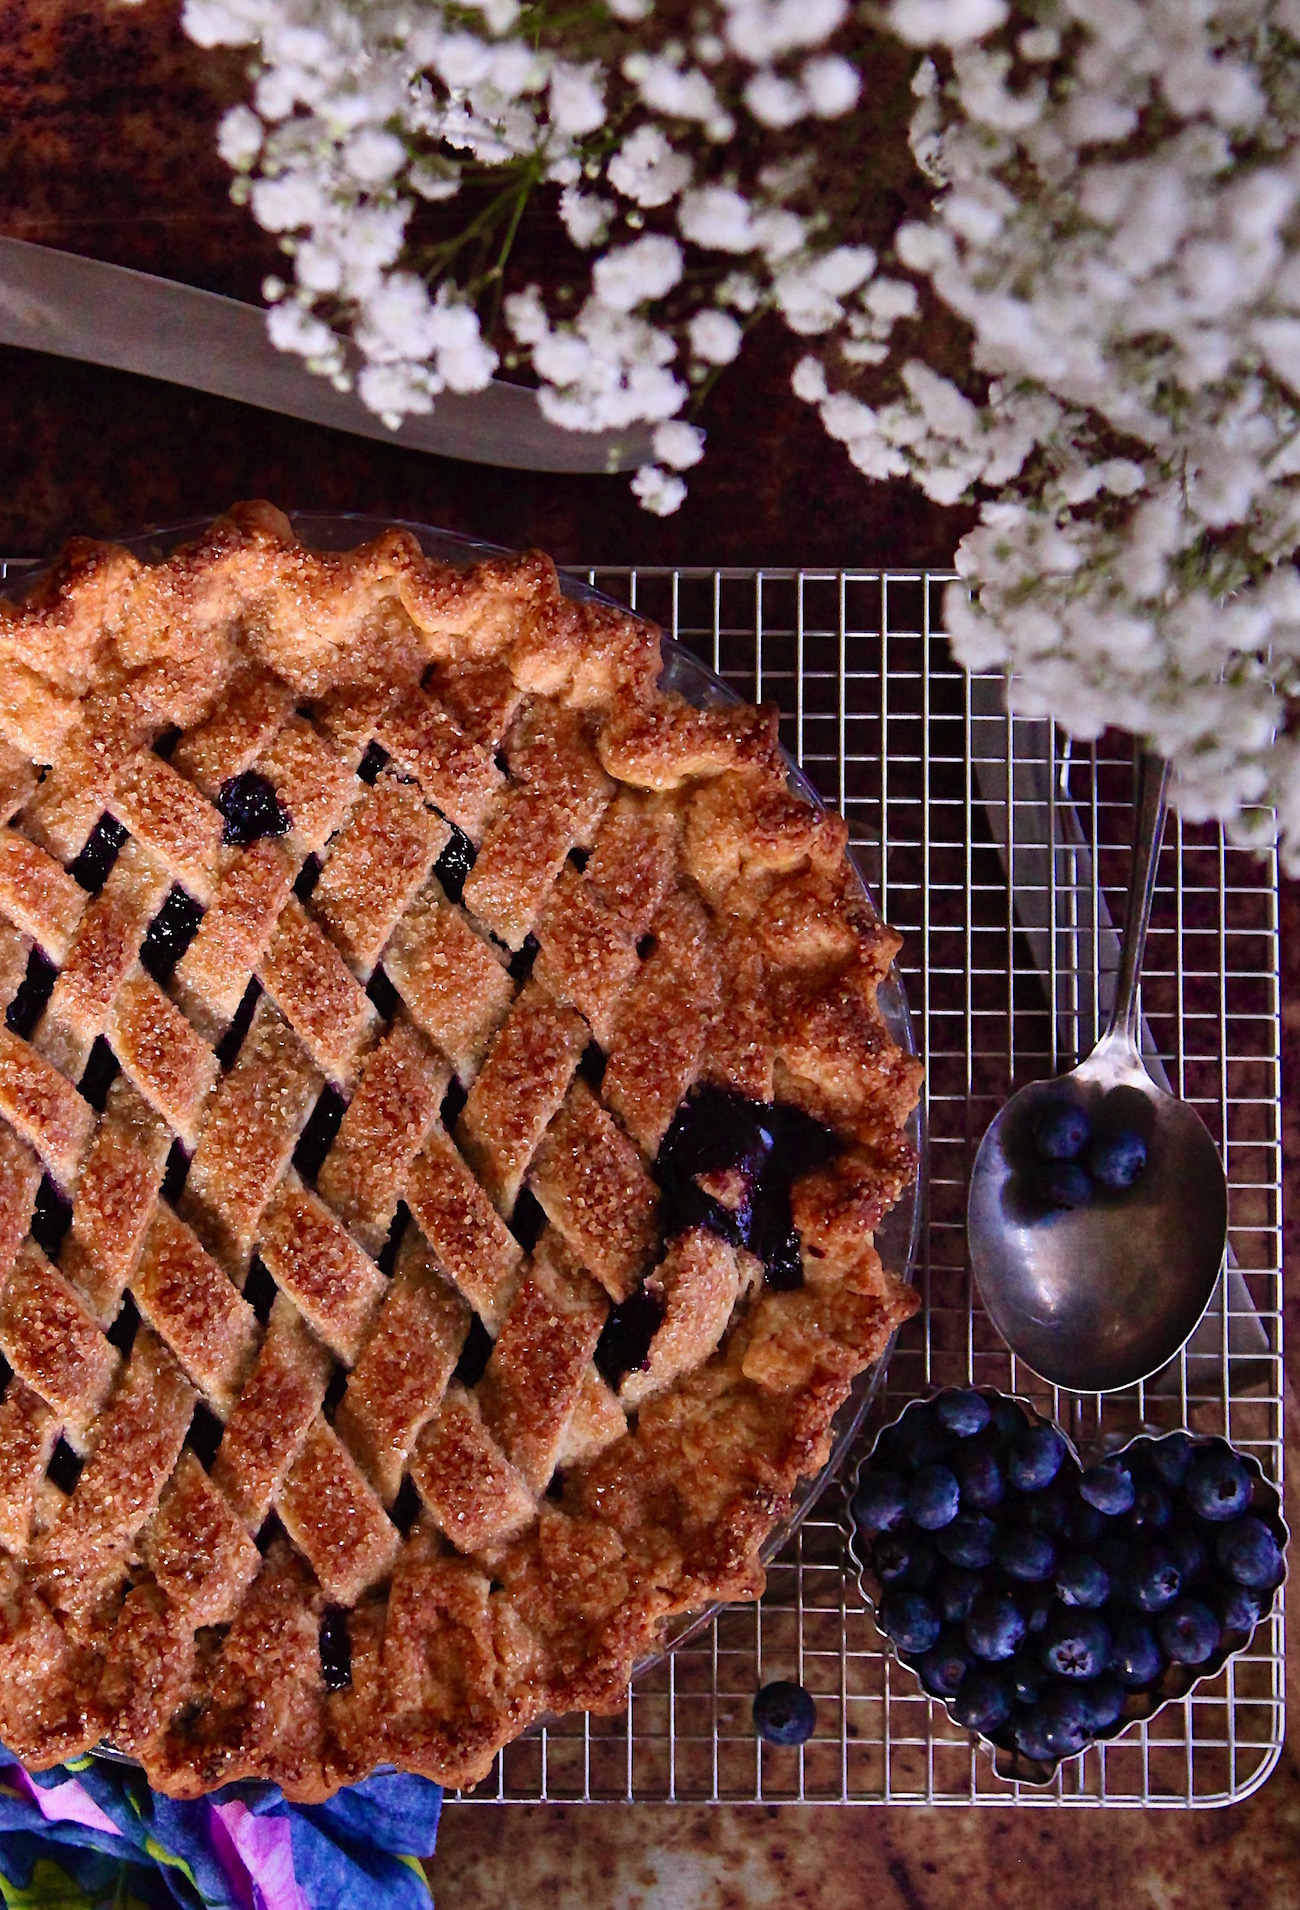 Homemade Buttery Crust Blueberry Pie